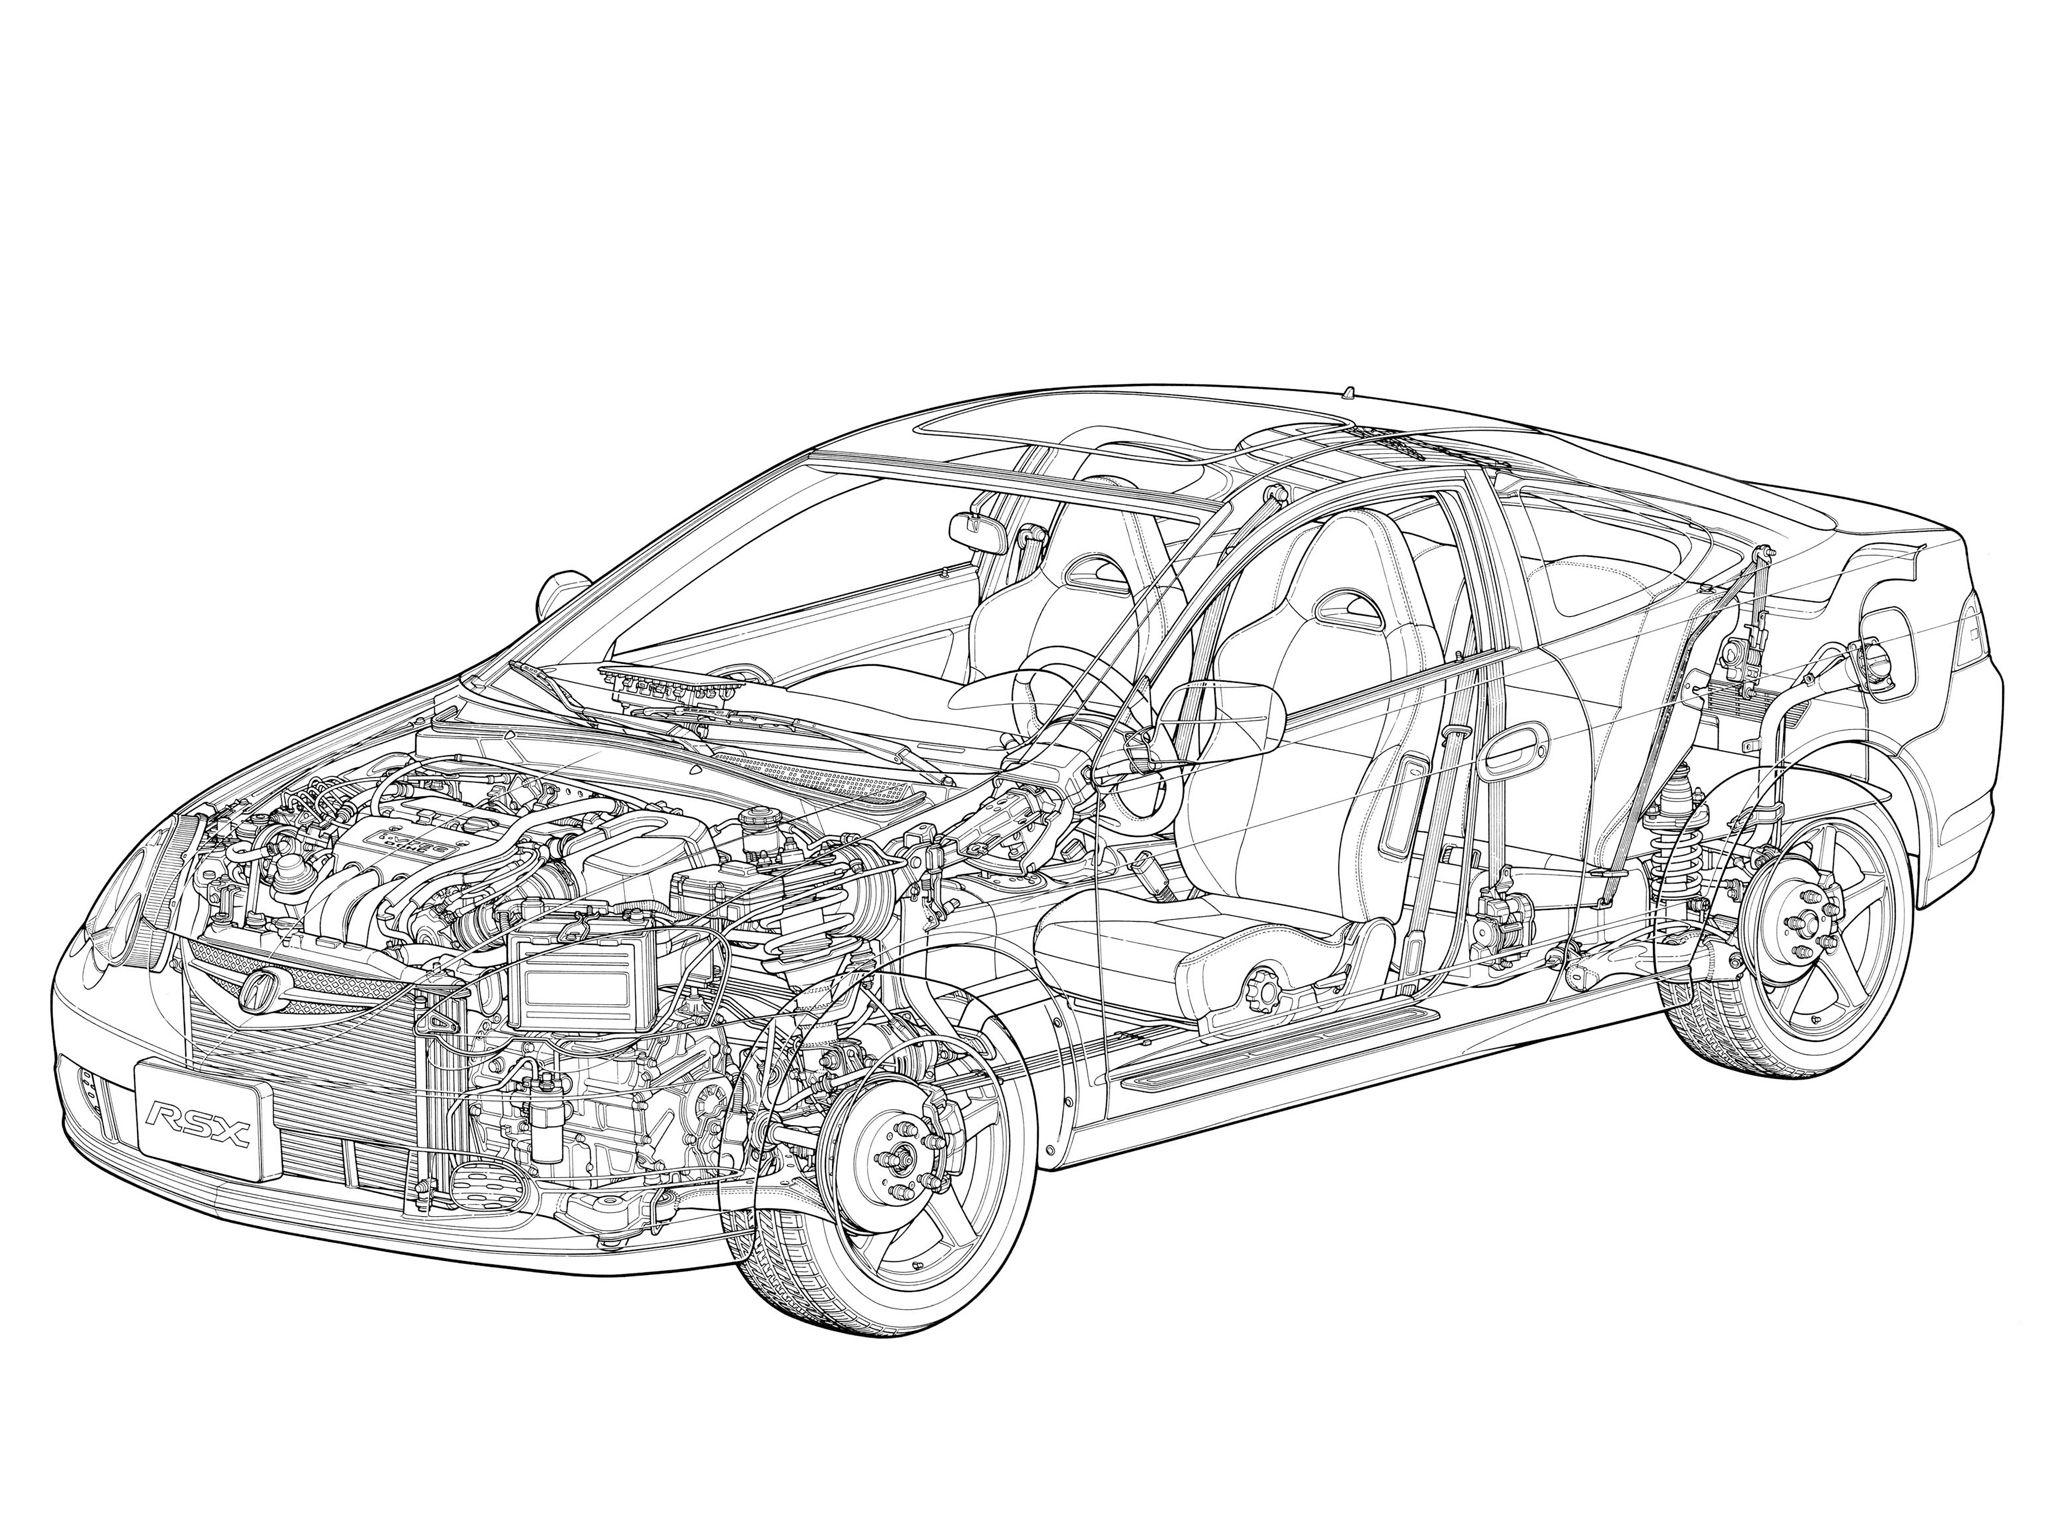 04 Acura Rsx